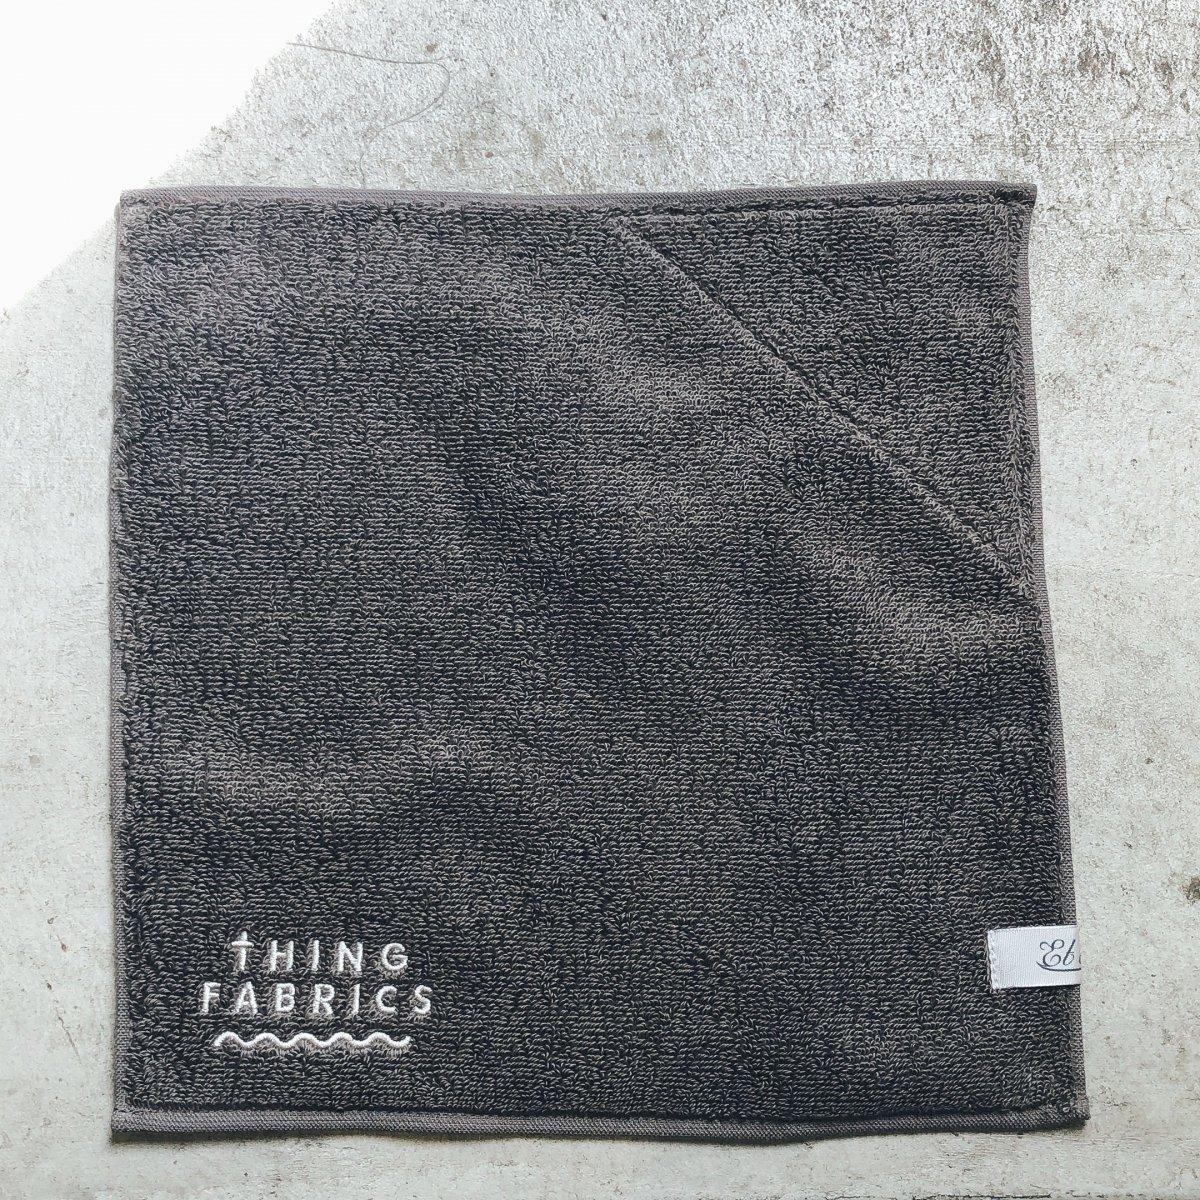 Et baas × THING FABRICS Pile HAND TOWL 詳細画像5